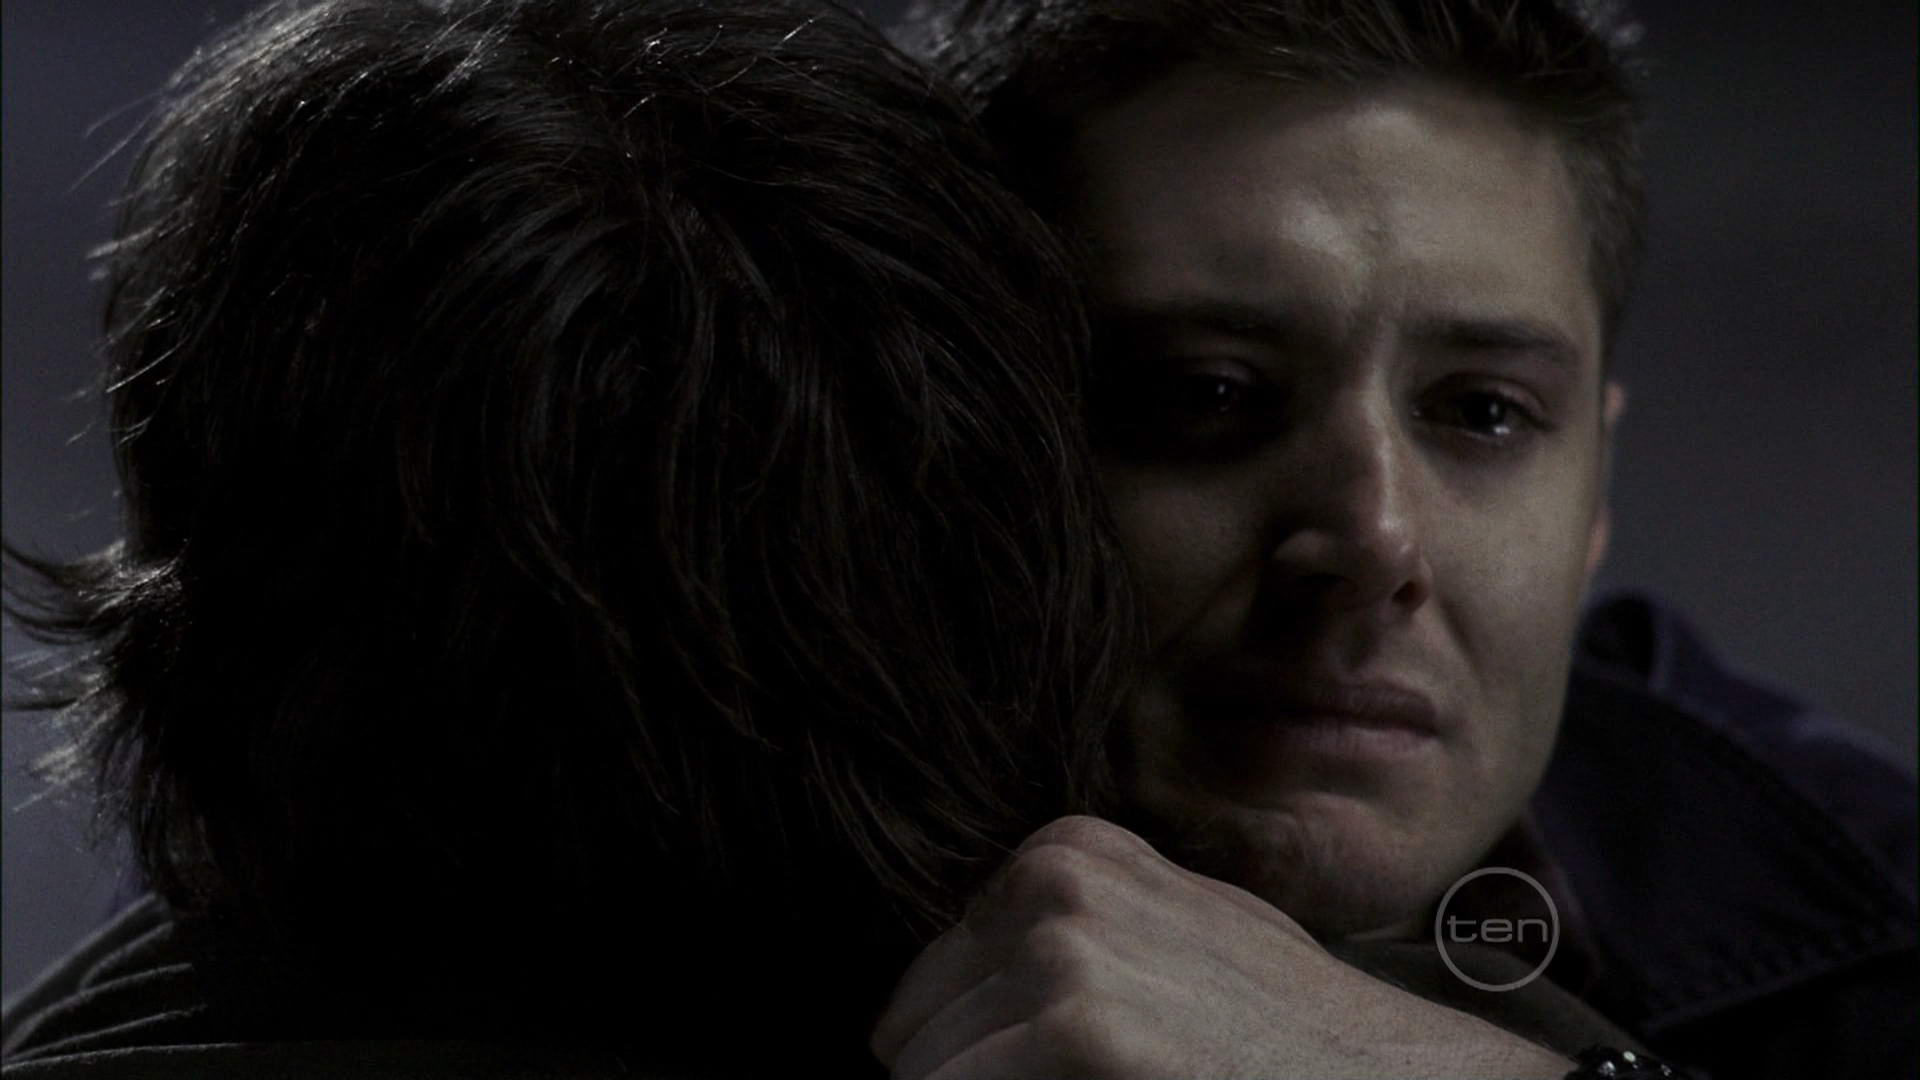 Some of the best sam dean supernatural moments familiar